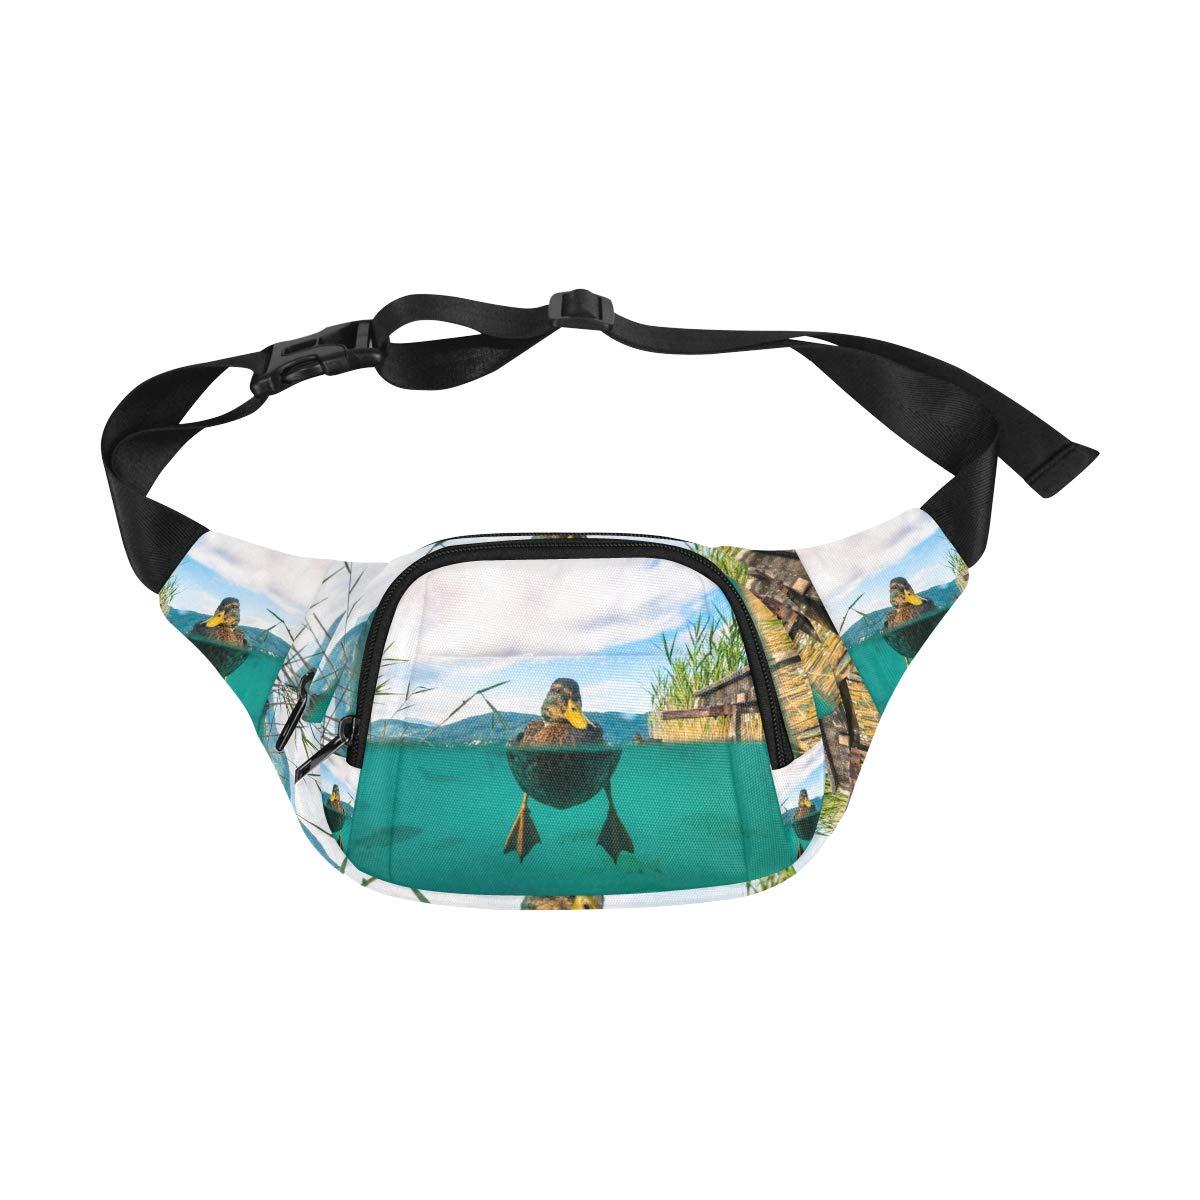 Lovely Yellow Rubber Duck Fenny Packs Waist Bags Adjustable Belt Waterproof Nylon Travel Running Sport Vacation Party For Men Women Boys Girls Kids